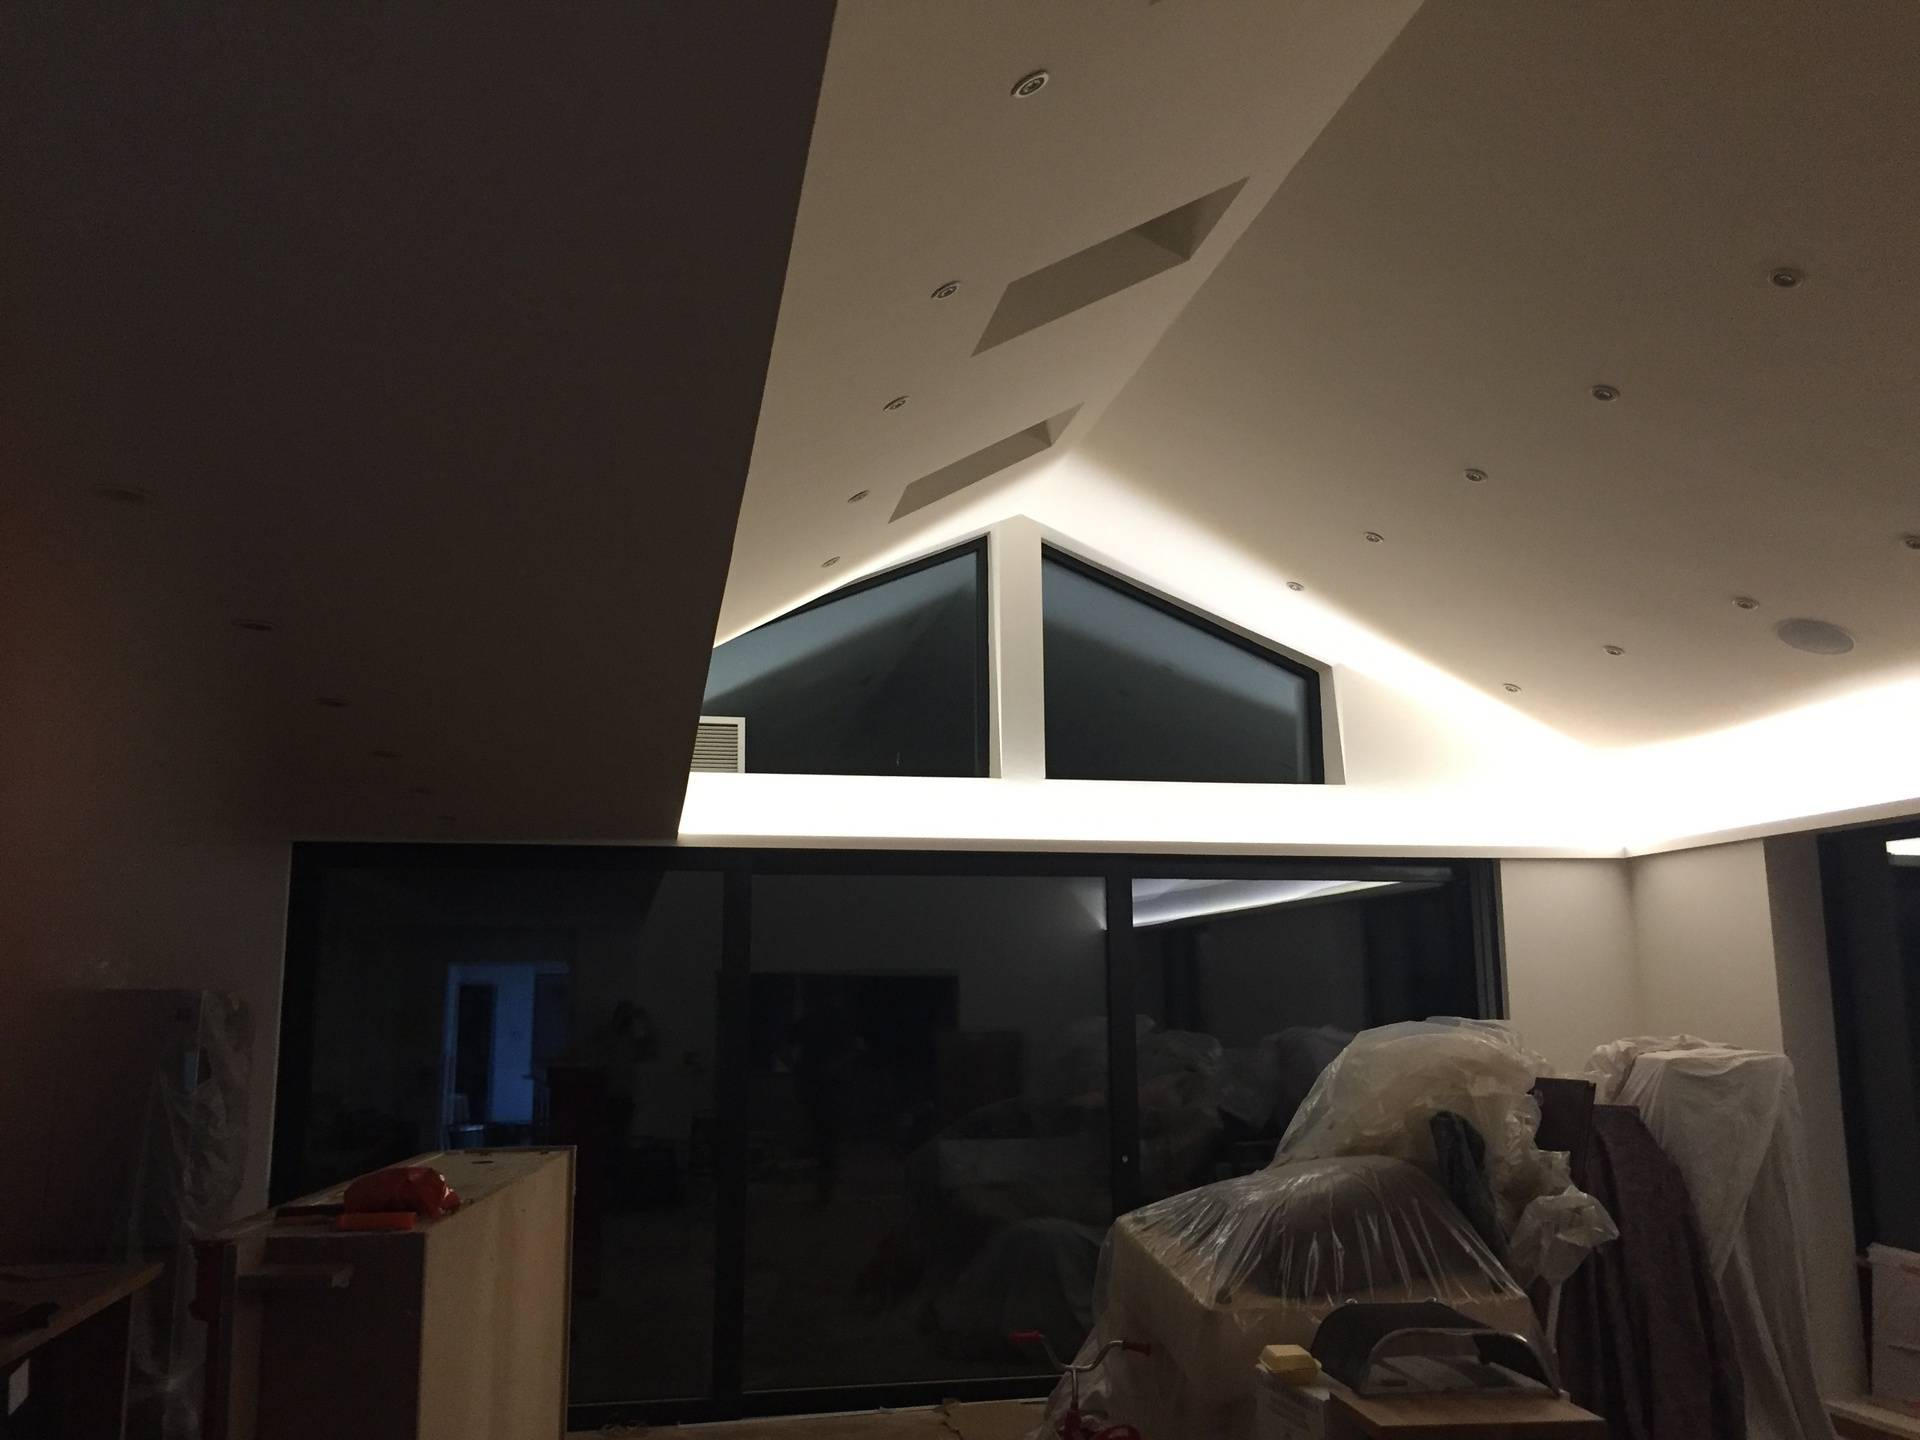 LED Plinth lights